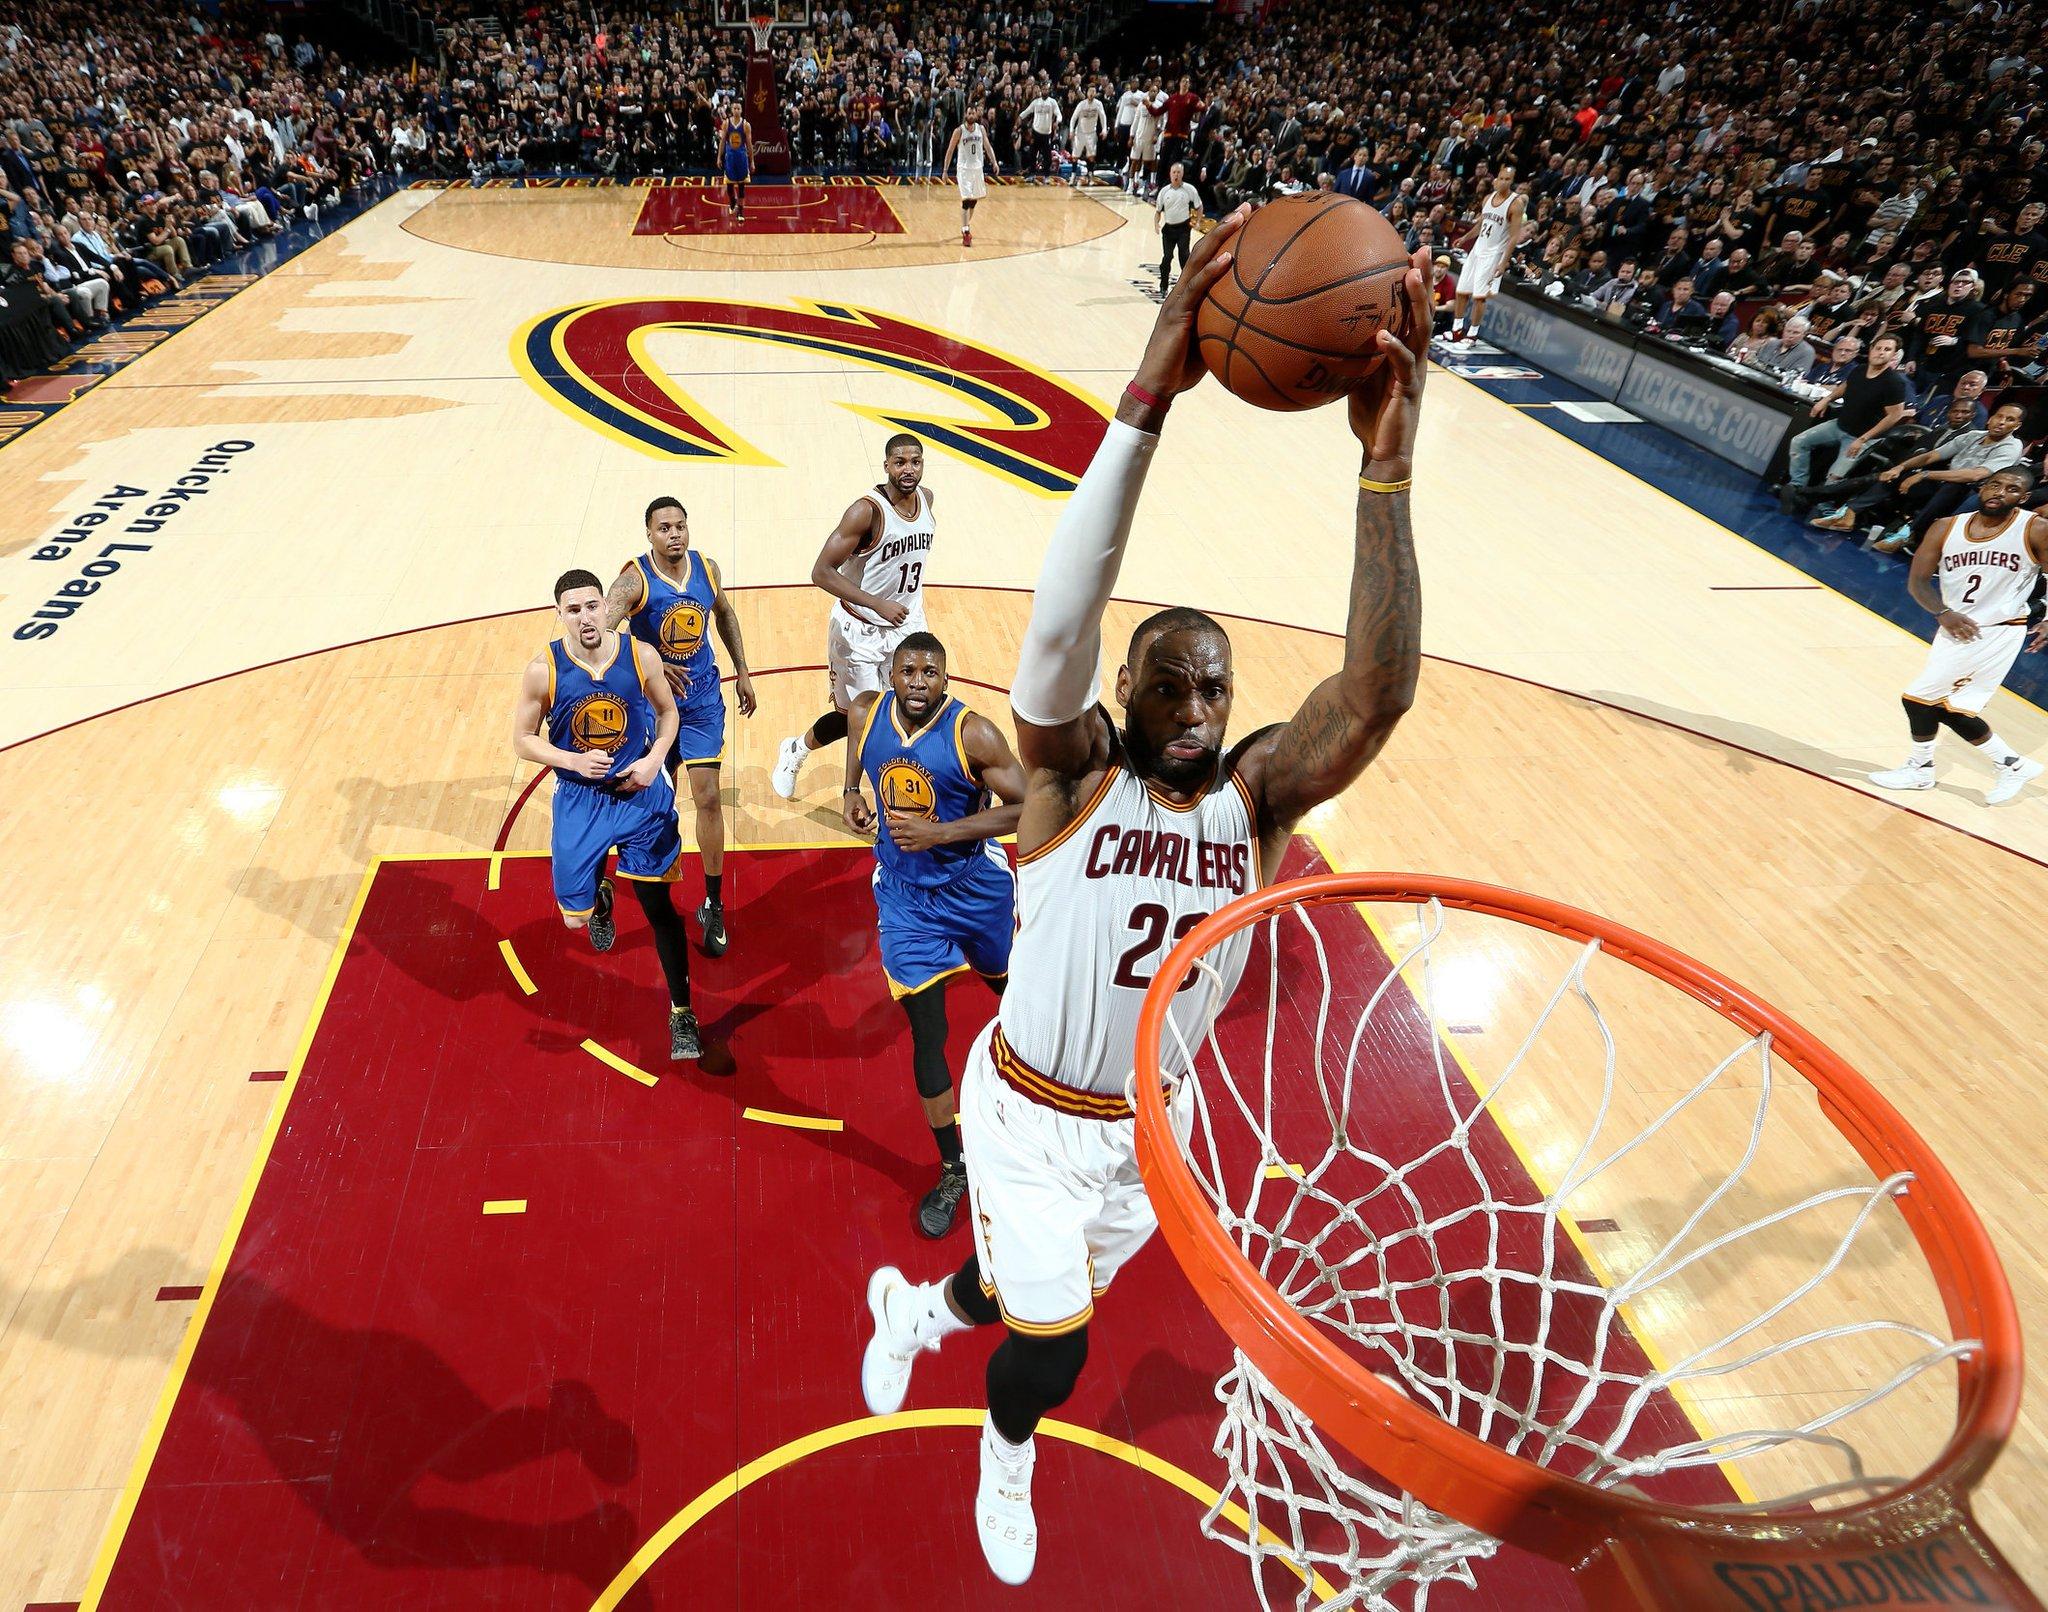 LeBron James - © twitter.com/nbastats